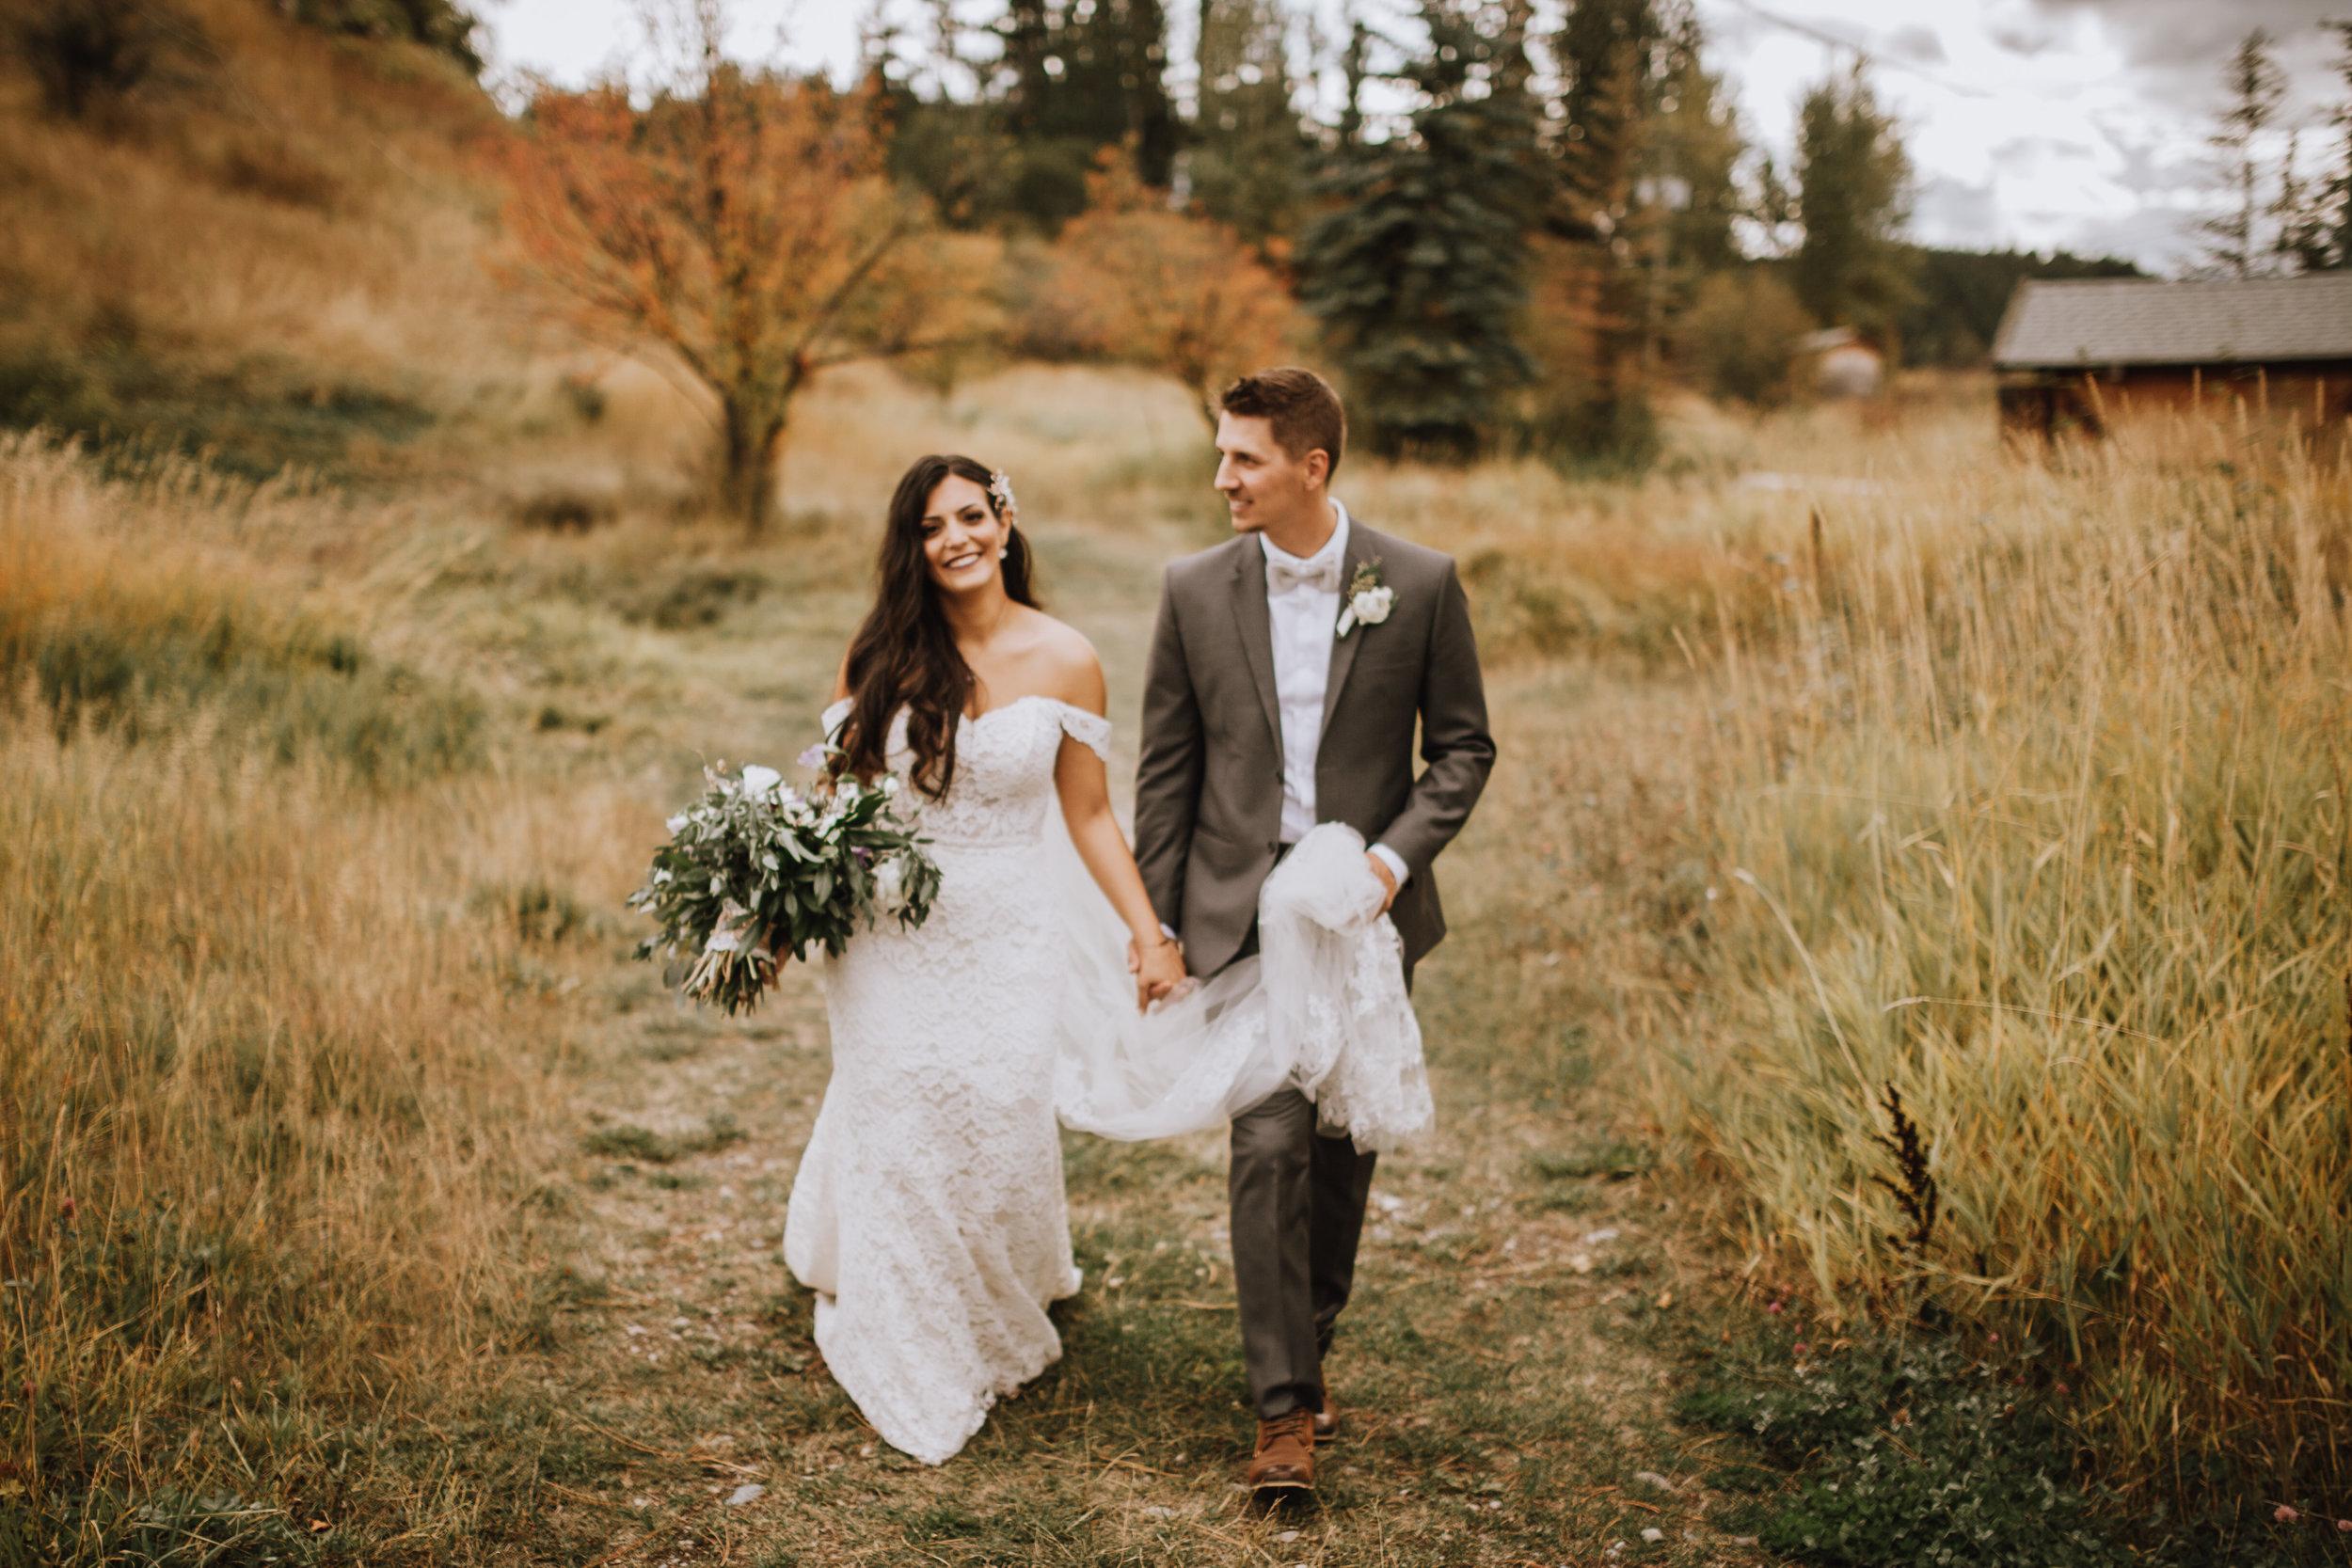 Kurt + Melissa 4 - Bridal Portraits-60.jpg